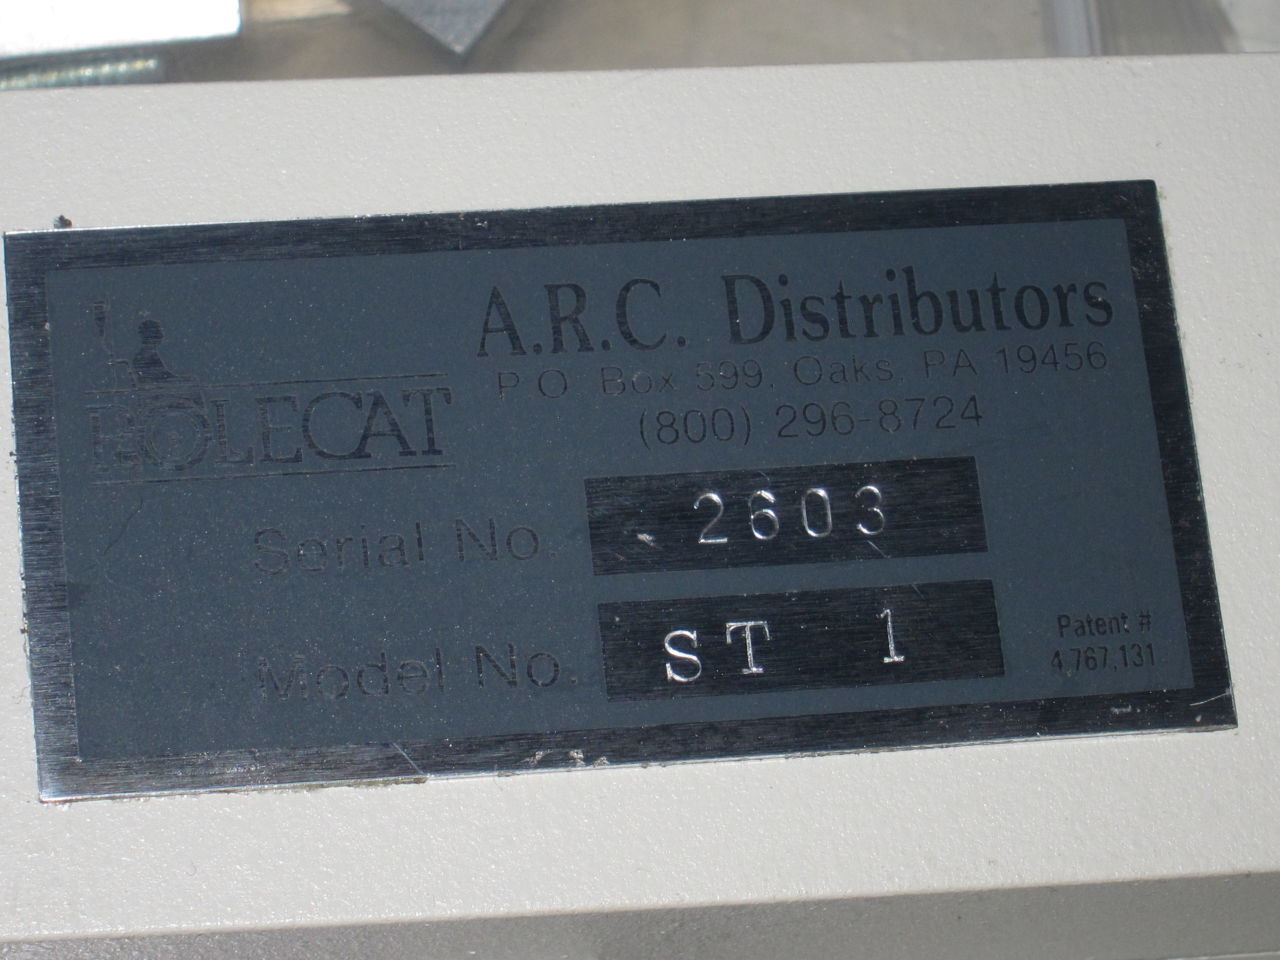 ARC DISTRIBUTORS Polecat ST-1 Accessory Wheelchair